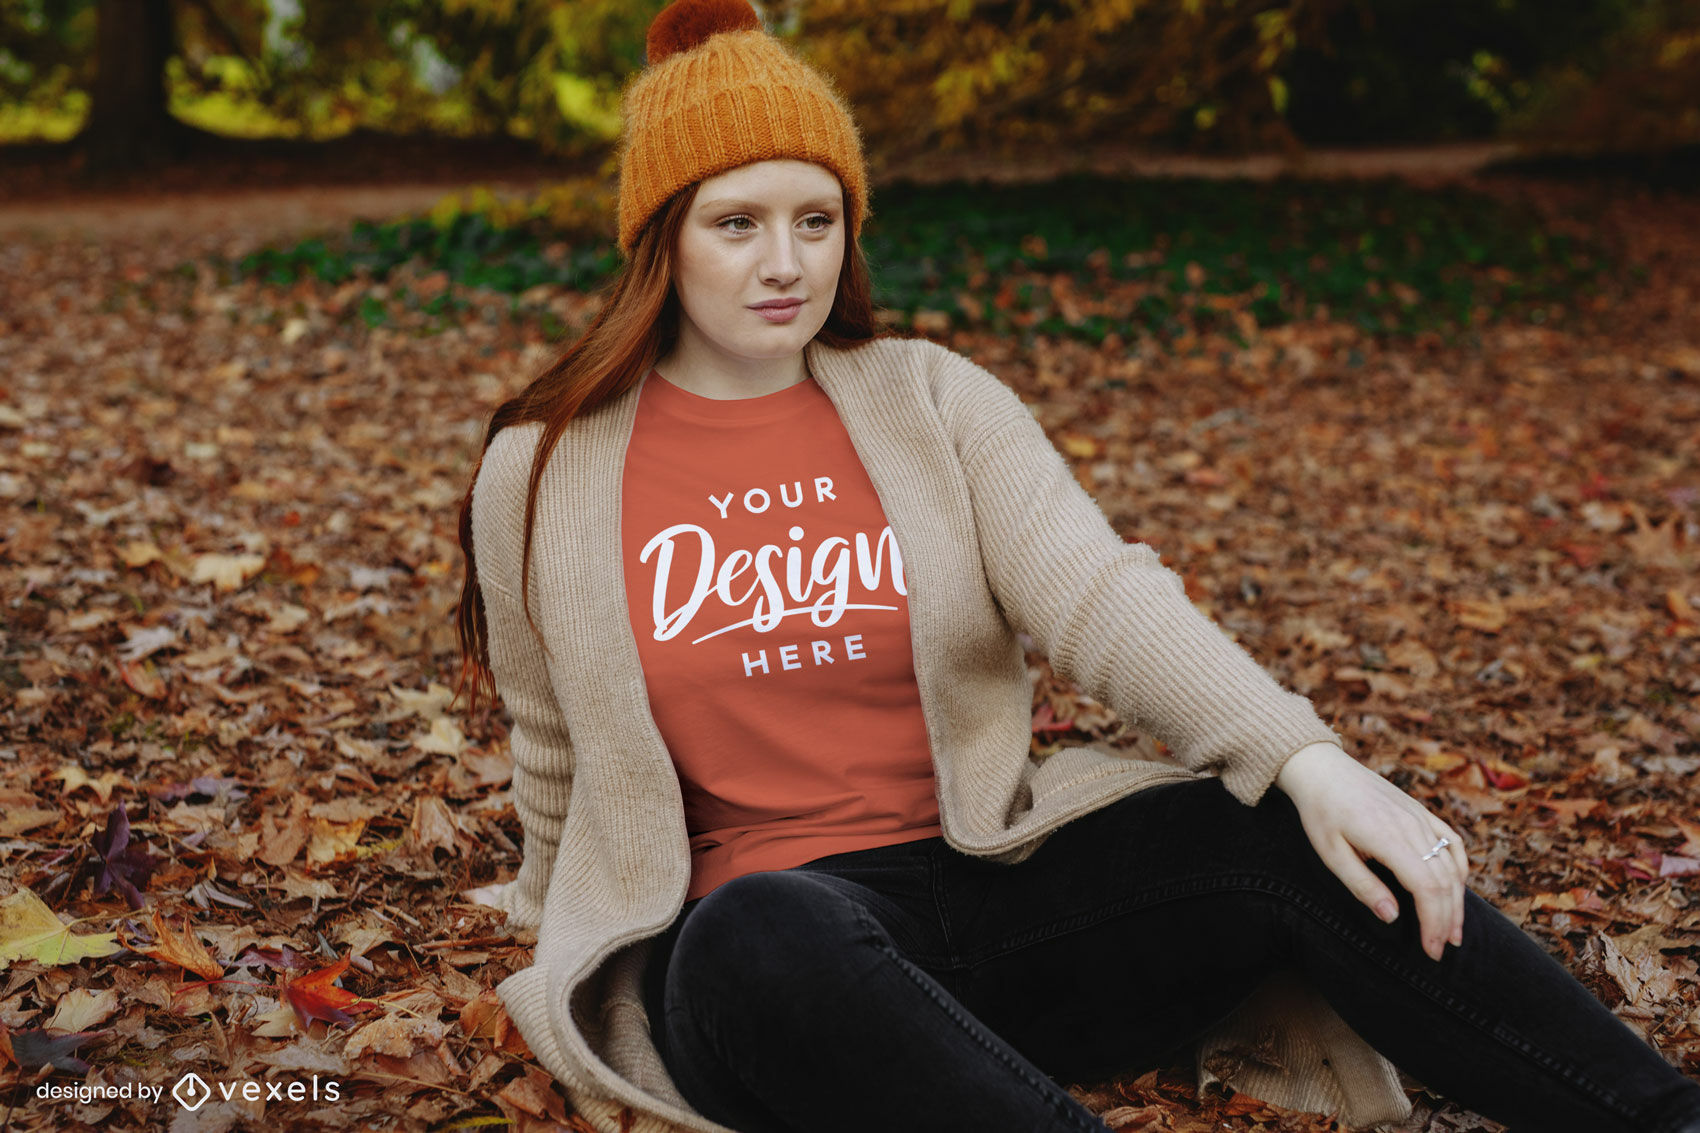 Redheaded girl sitting on fall leaves t-shirt mockup